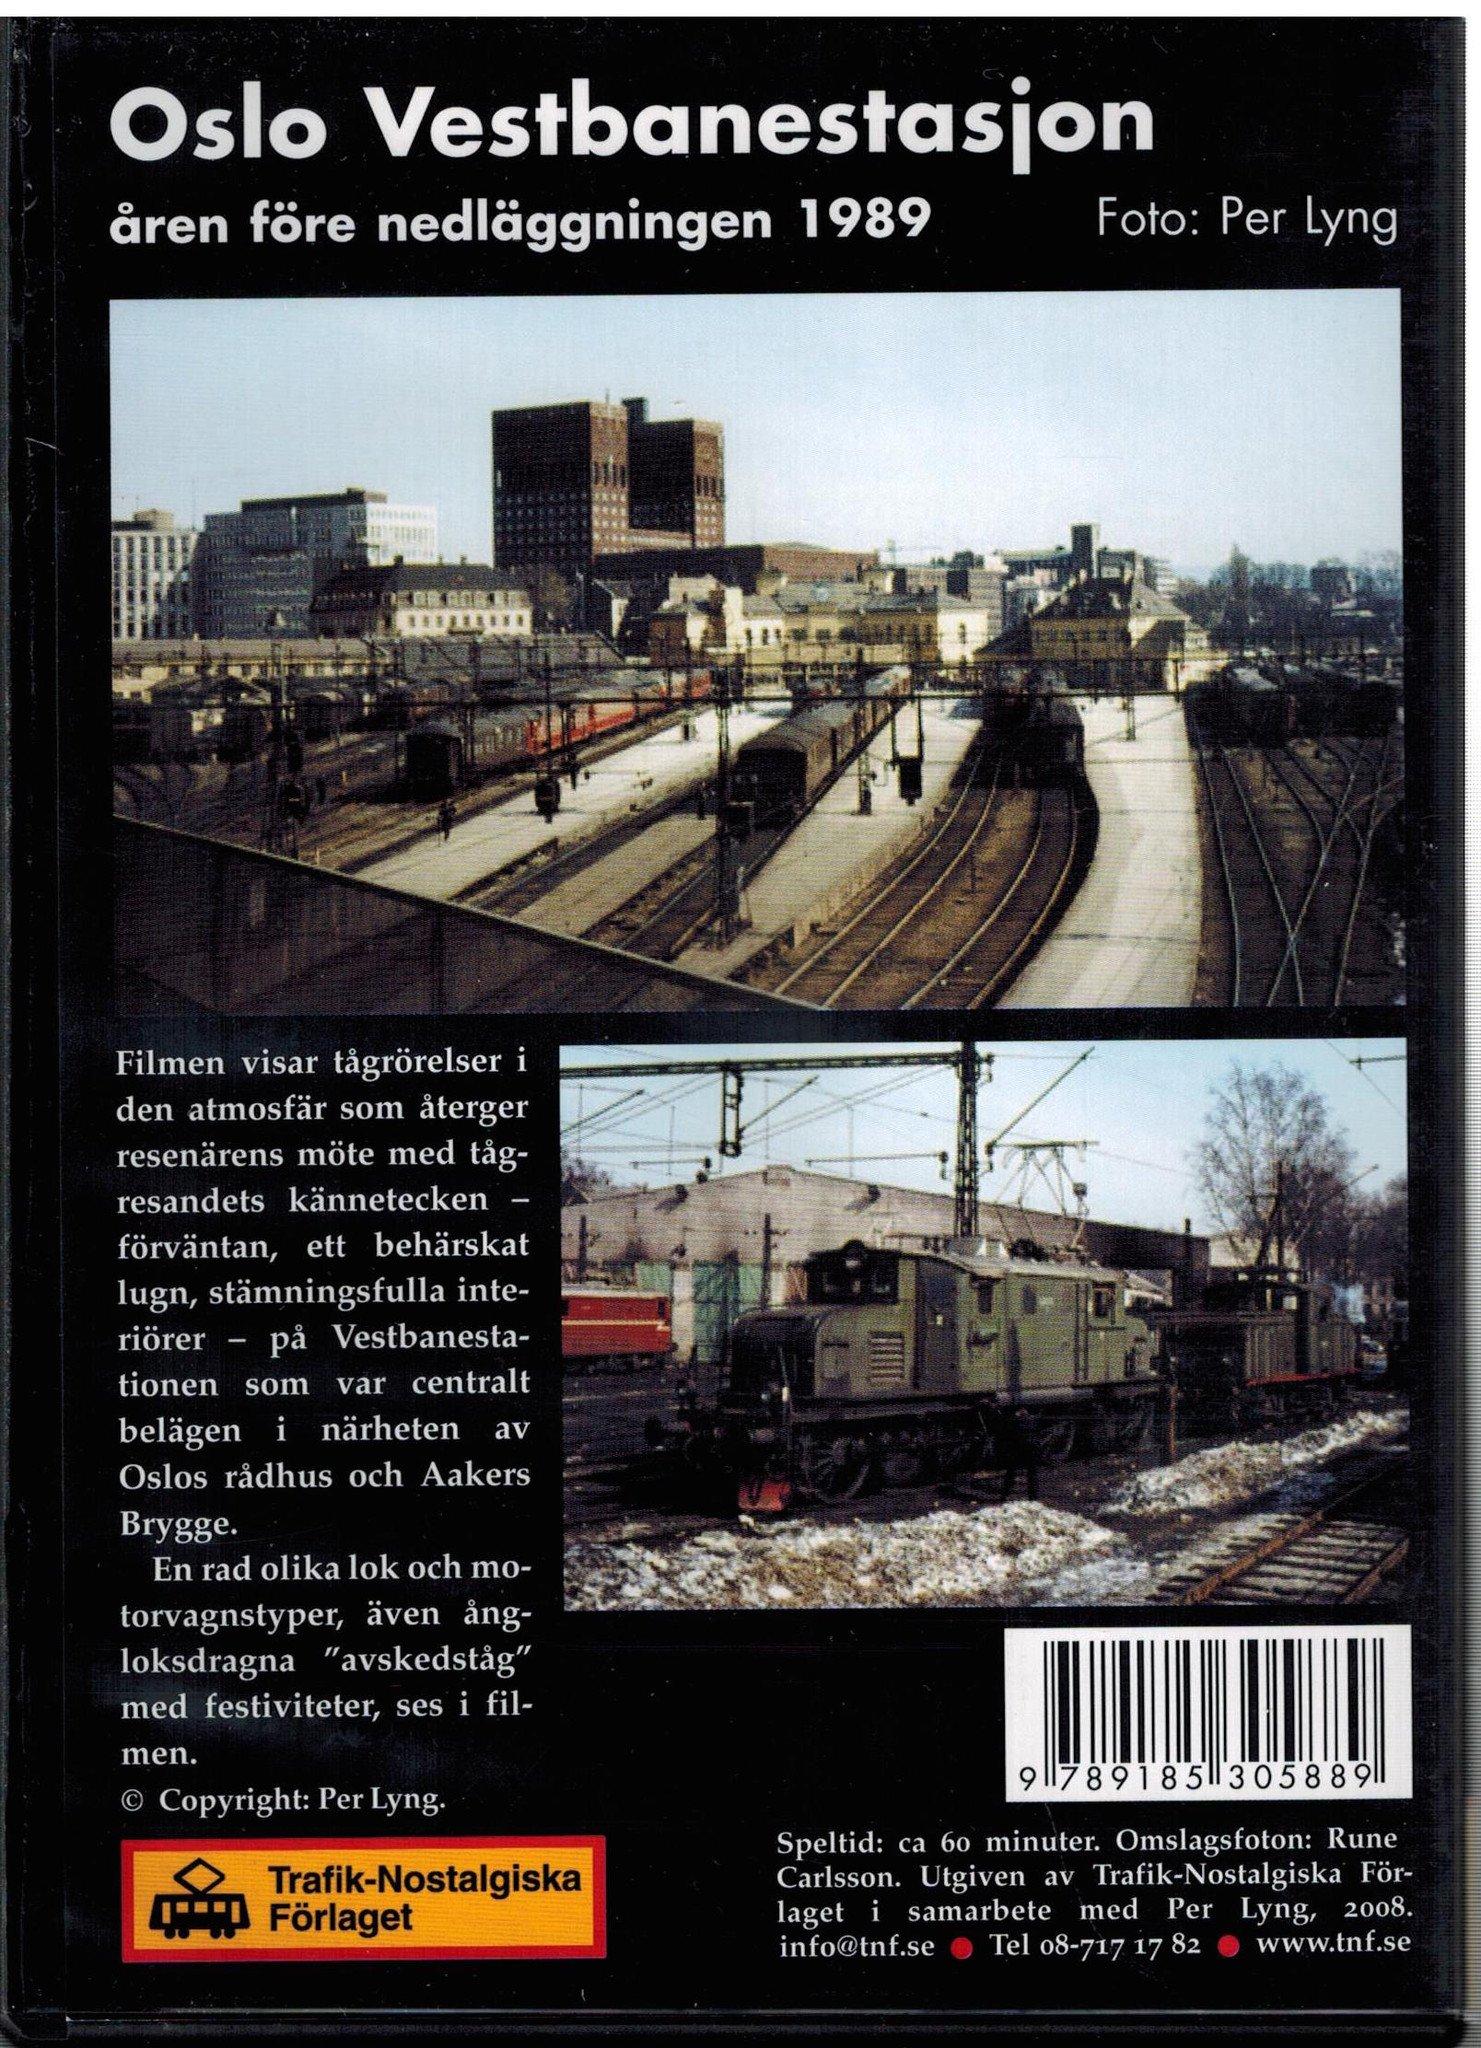 Oslo Vestbanestasjon åren före nedläggingen 1989